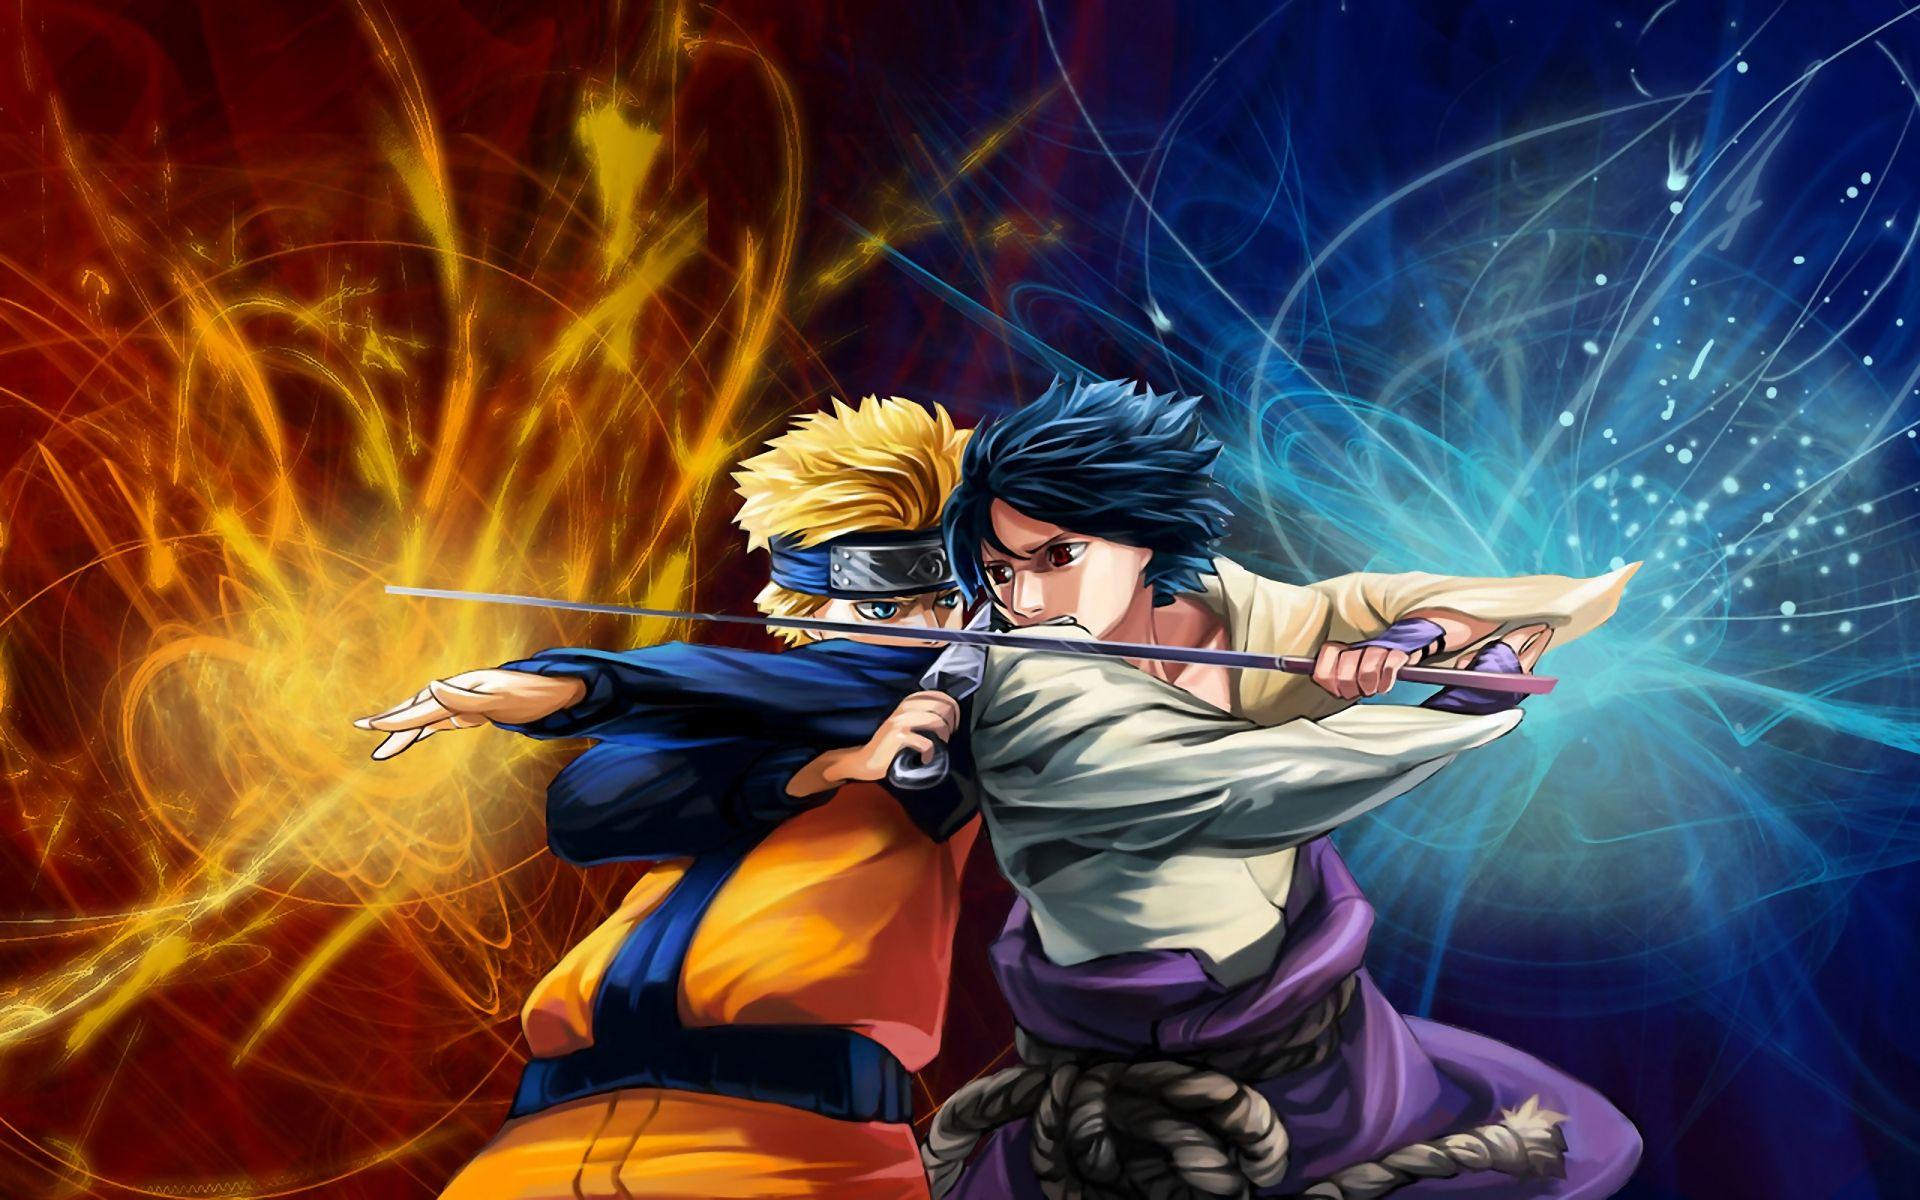 Naruto Art Wallpaper Hd, Background